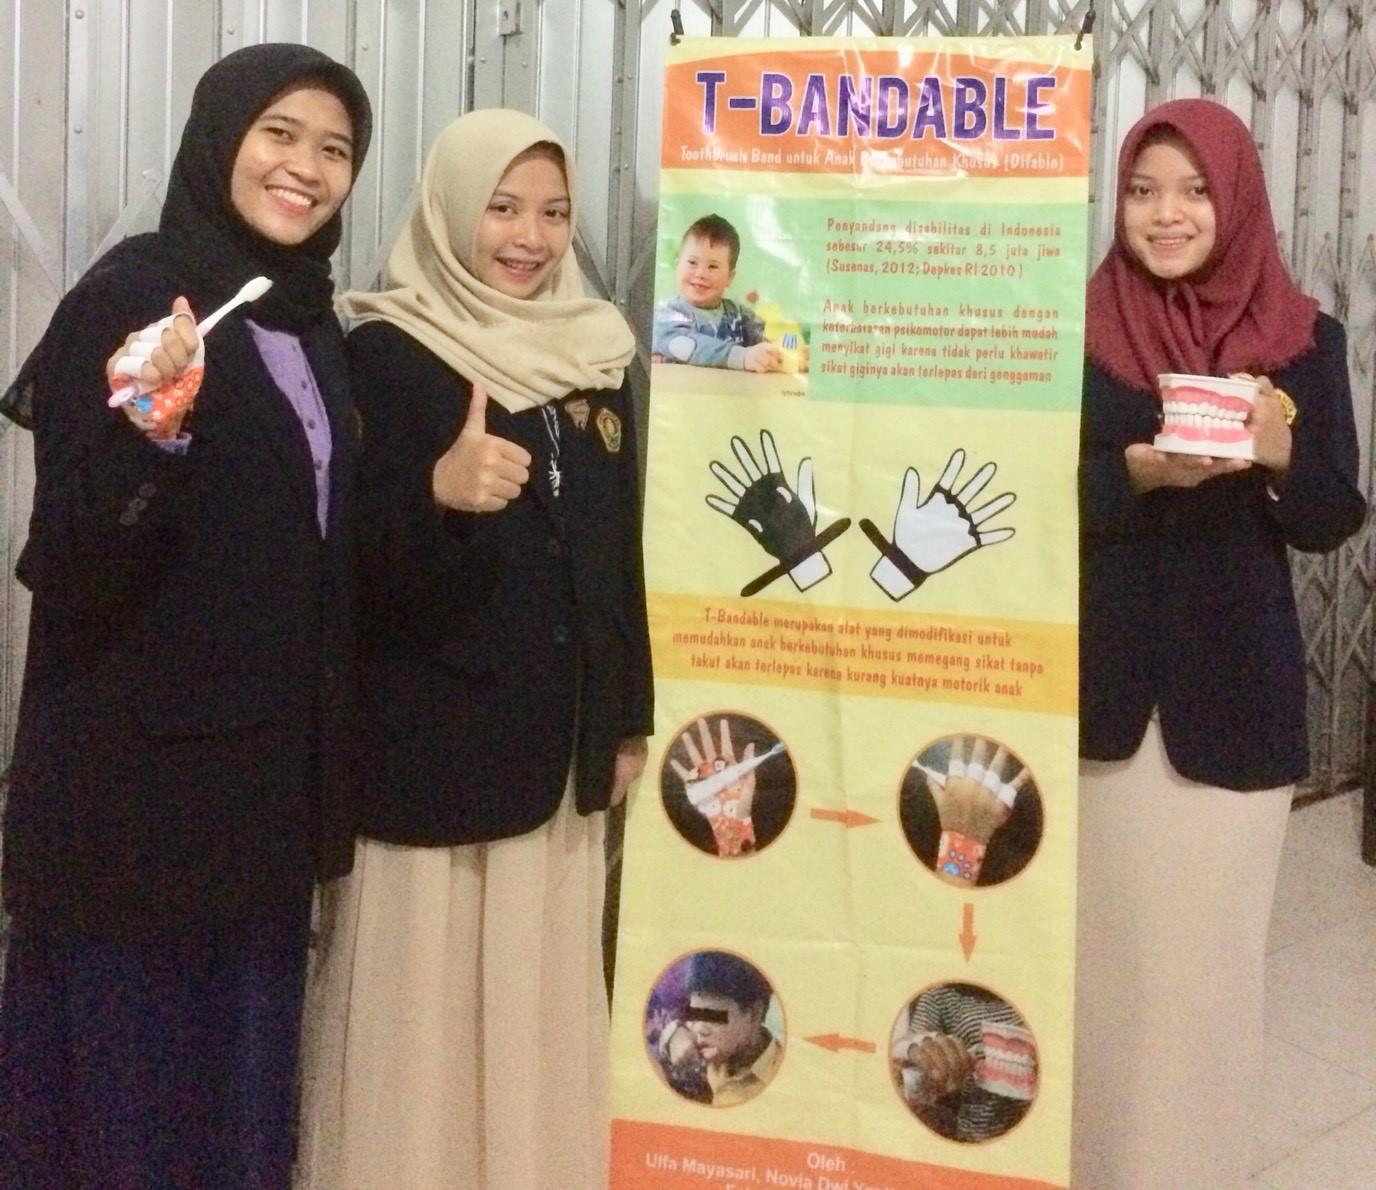 <em>T-Bandable</em>, Hasil Karya Cipta PKM FKG Universitas Jember